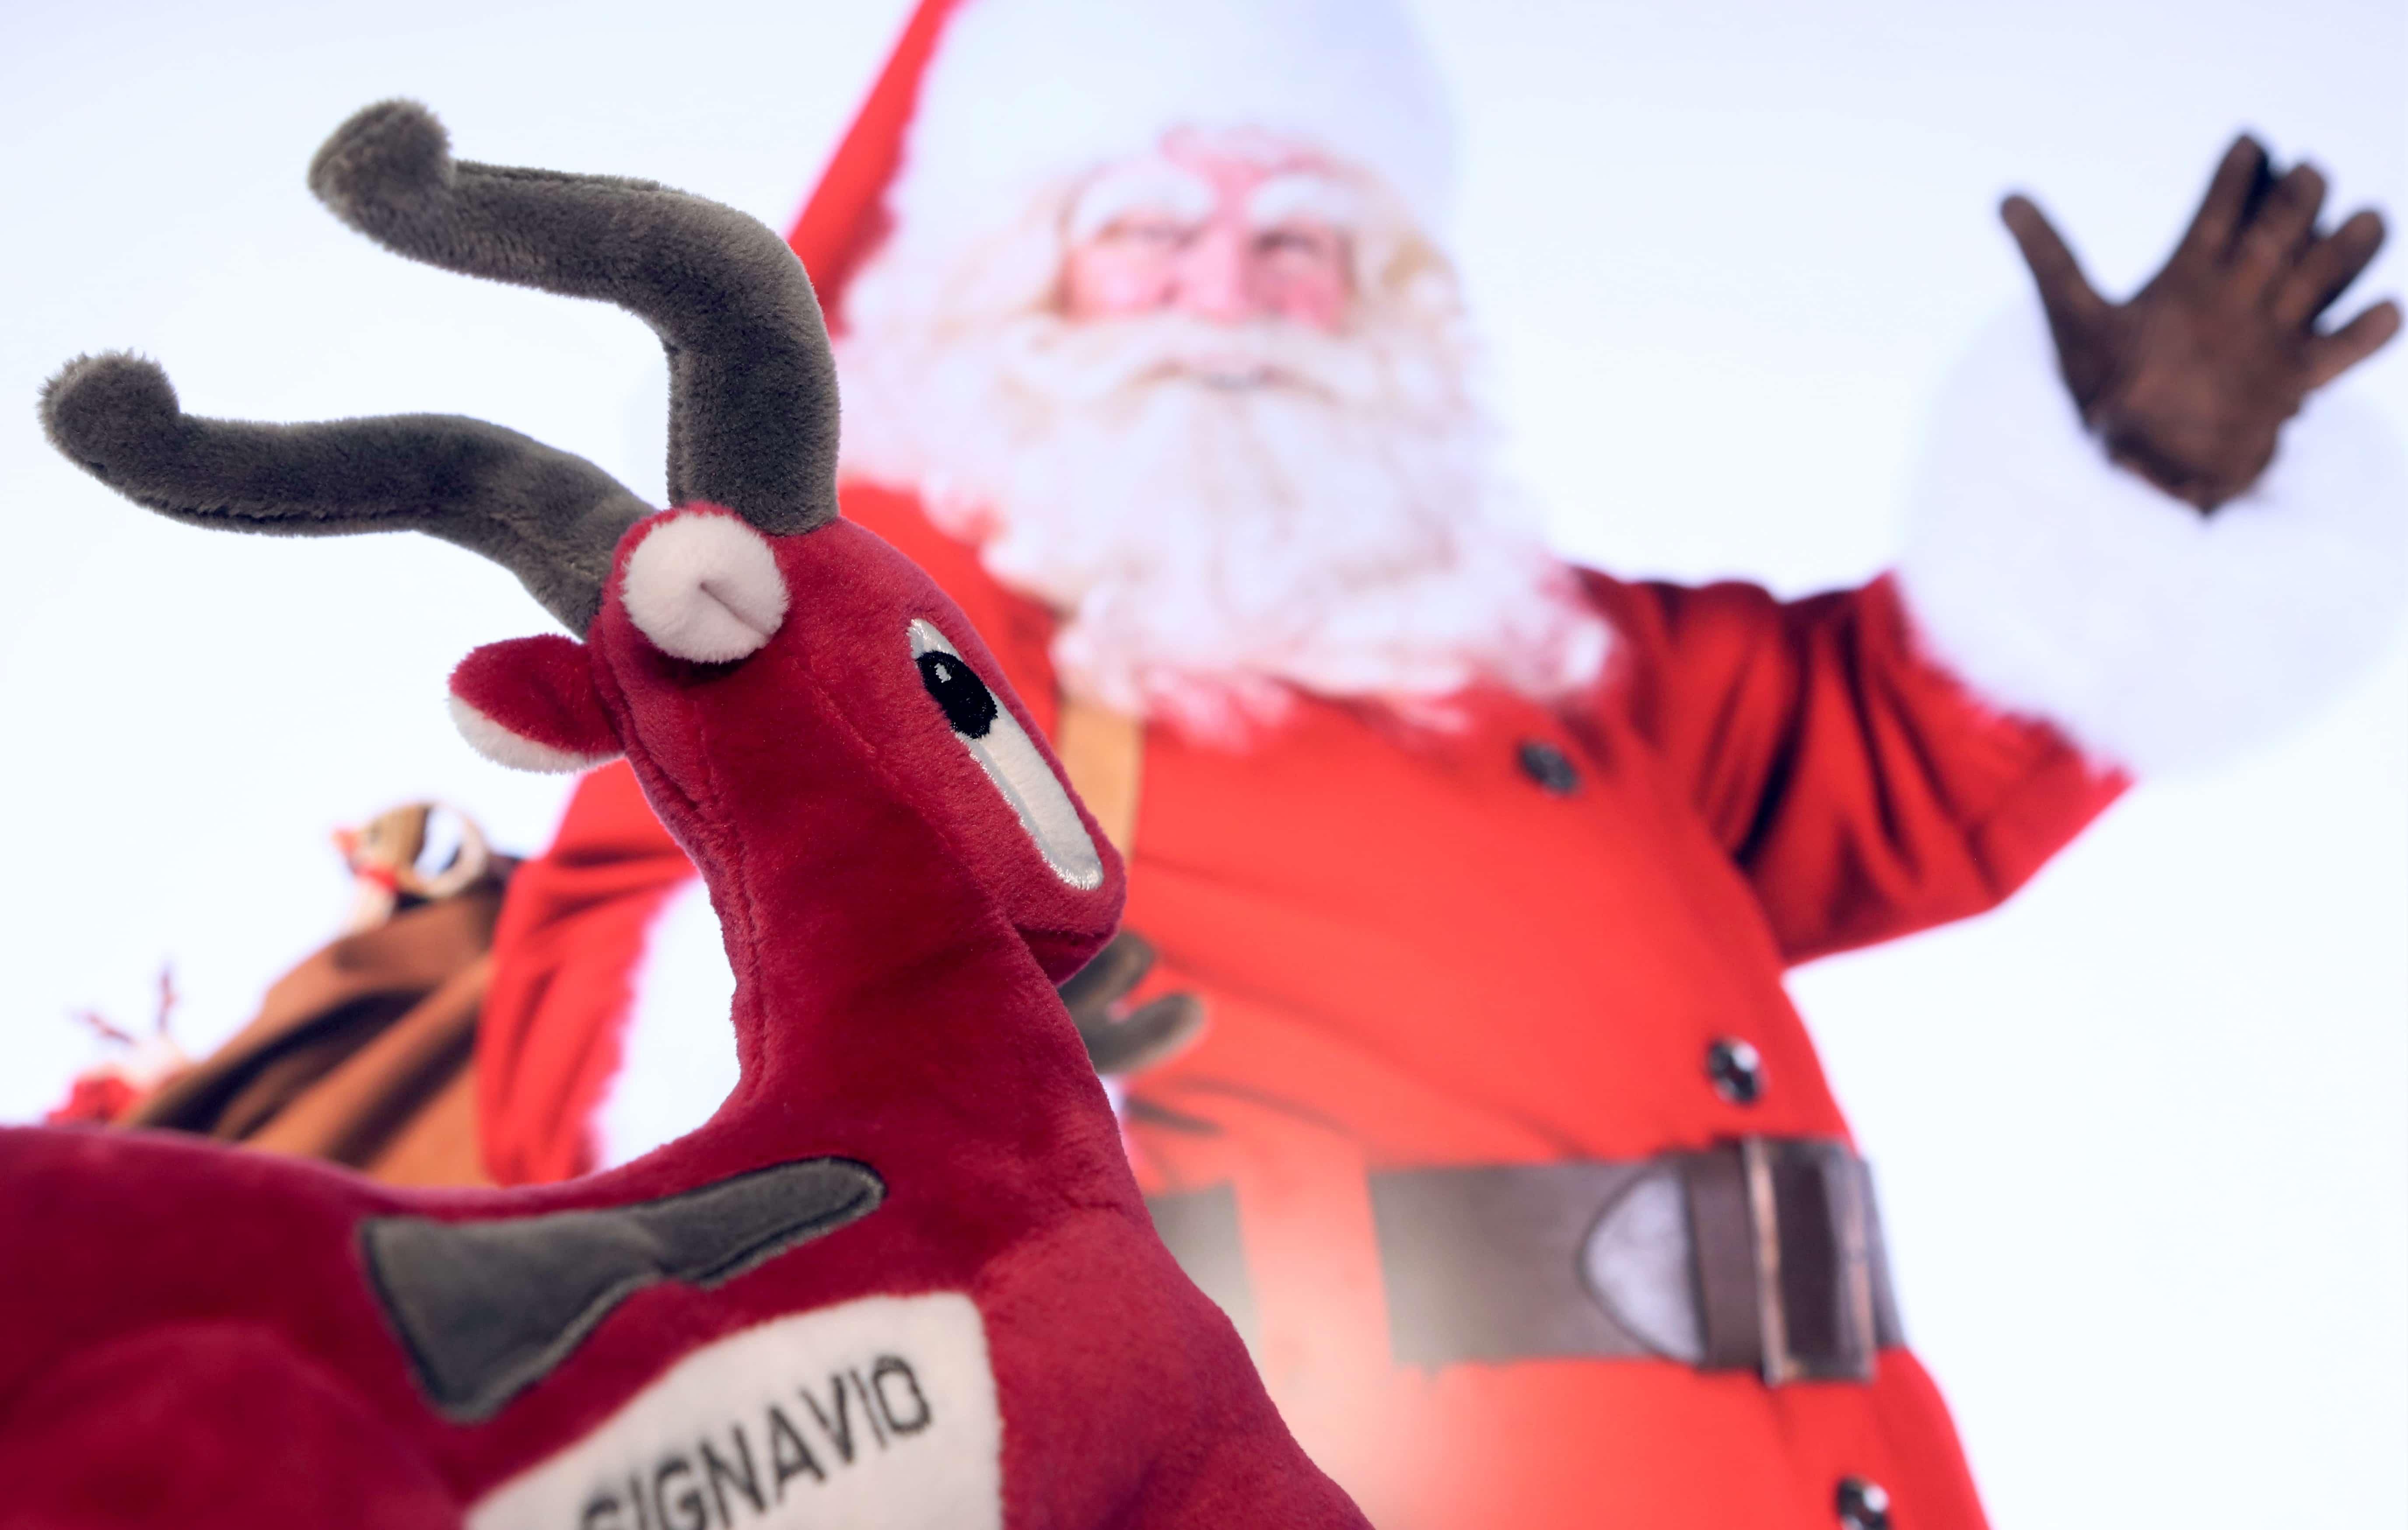 Signavio Gazelle looking at Father Christmas